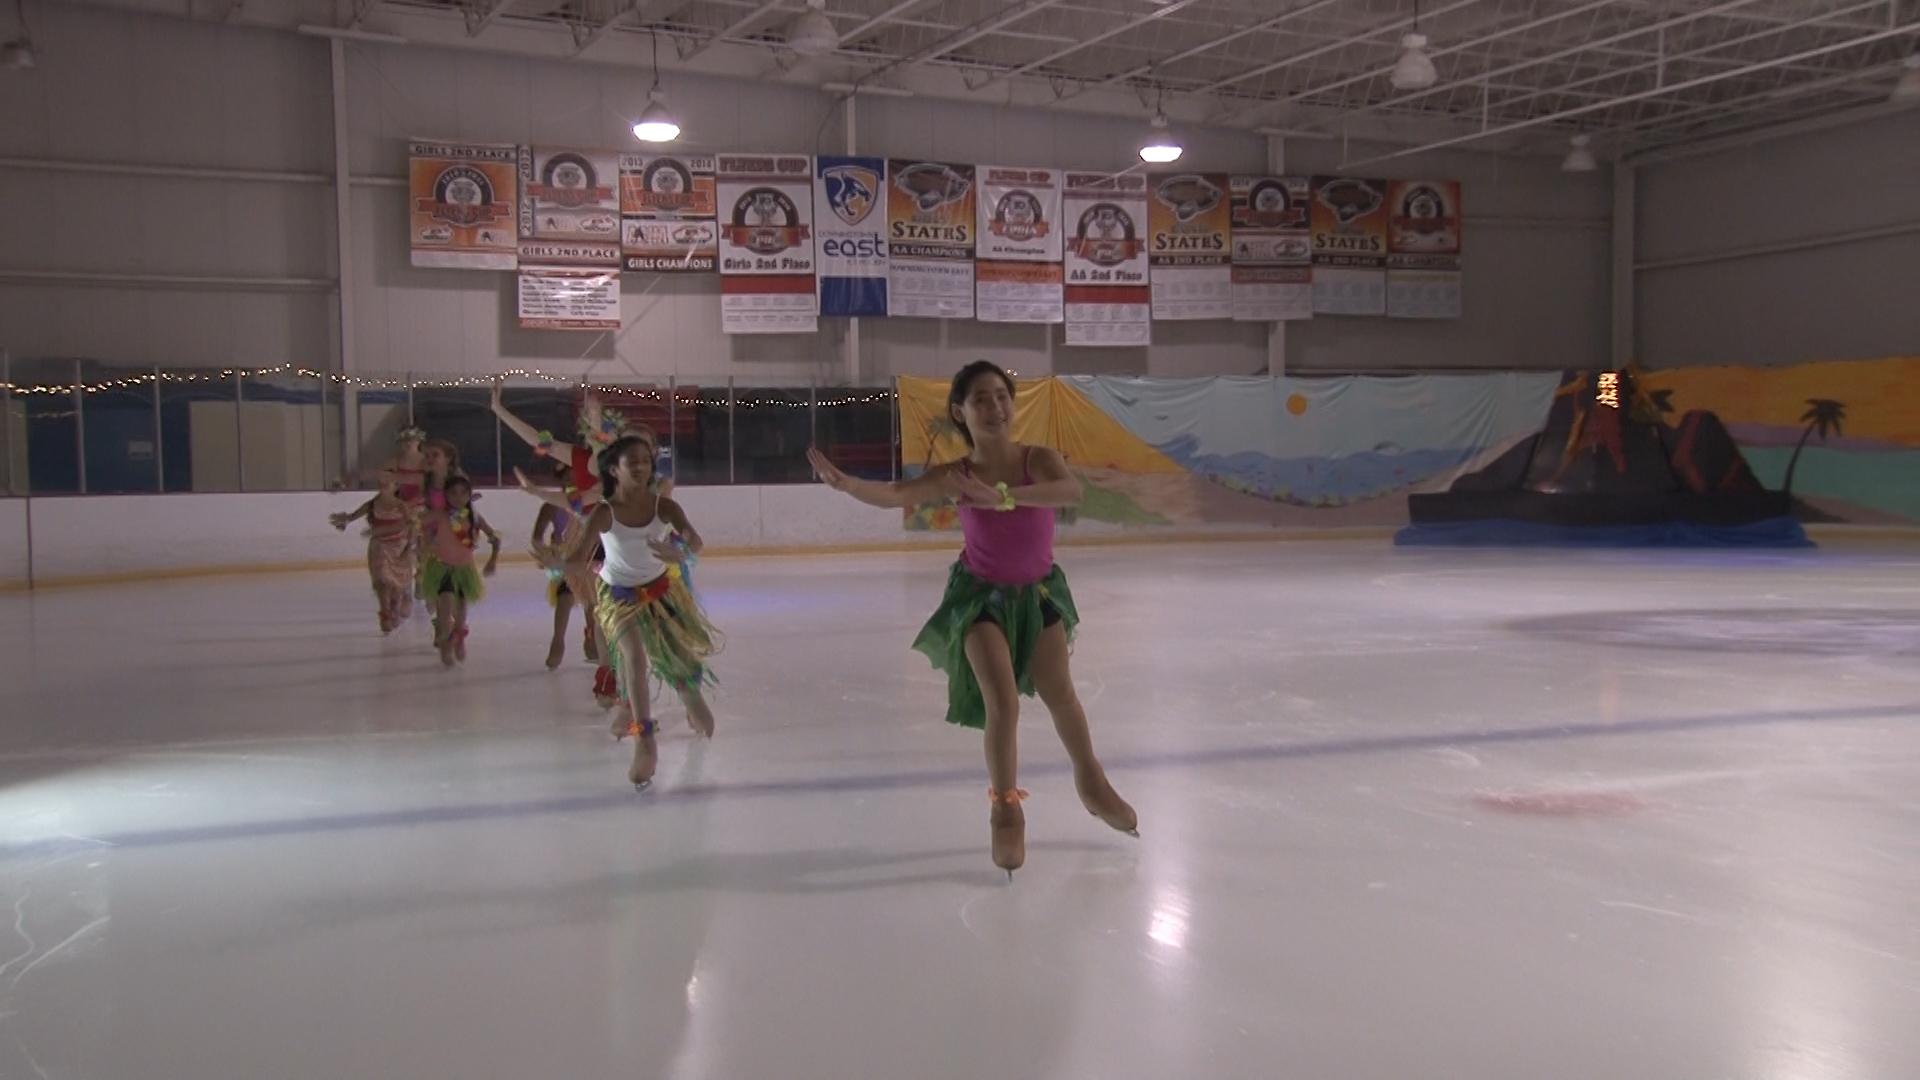 Power Play Maui Skate on Ice 071417.00_11_21_16.Still018.jpg